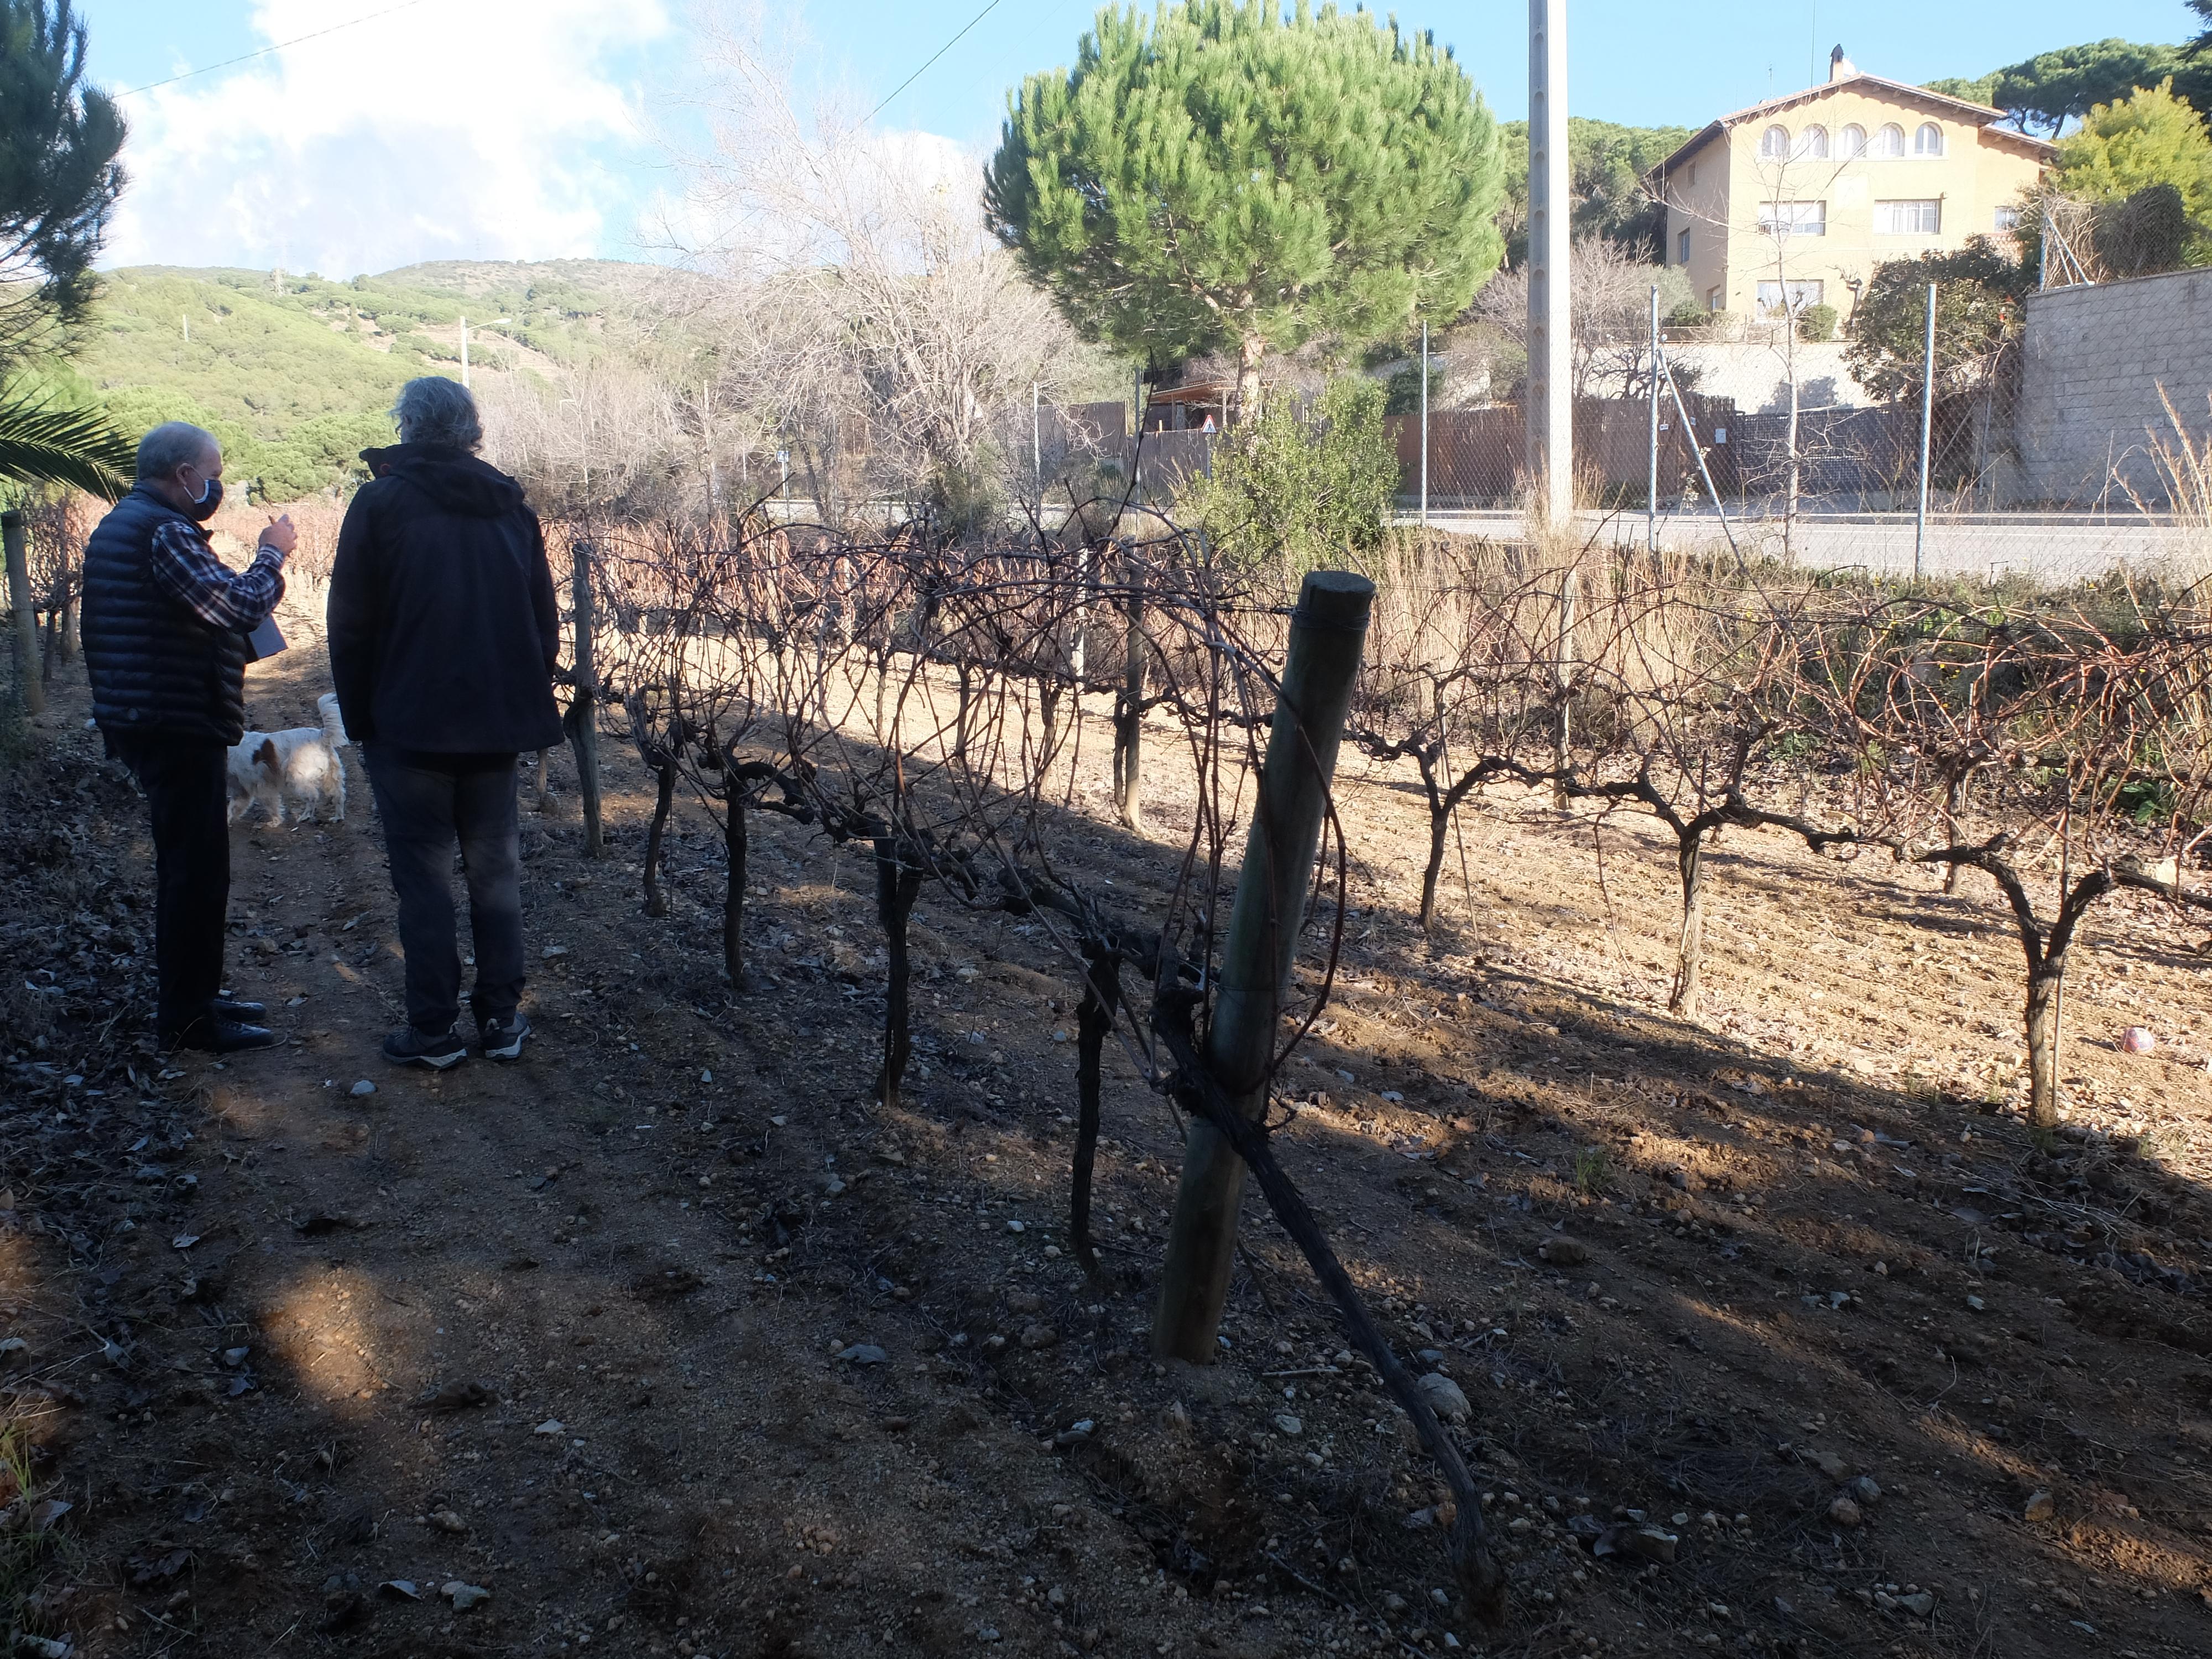 Clase magistral de Josep Coll sobre el terreno, Masia Coll - Canyet (Badalona)